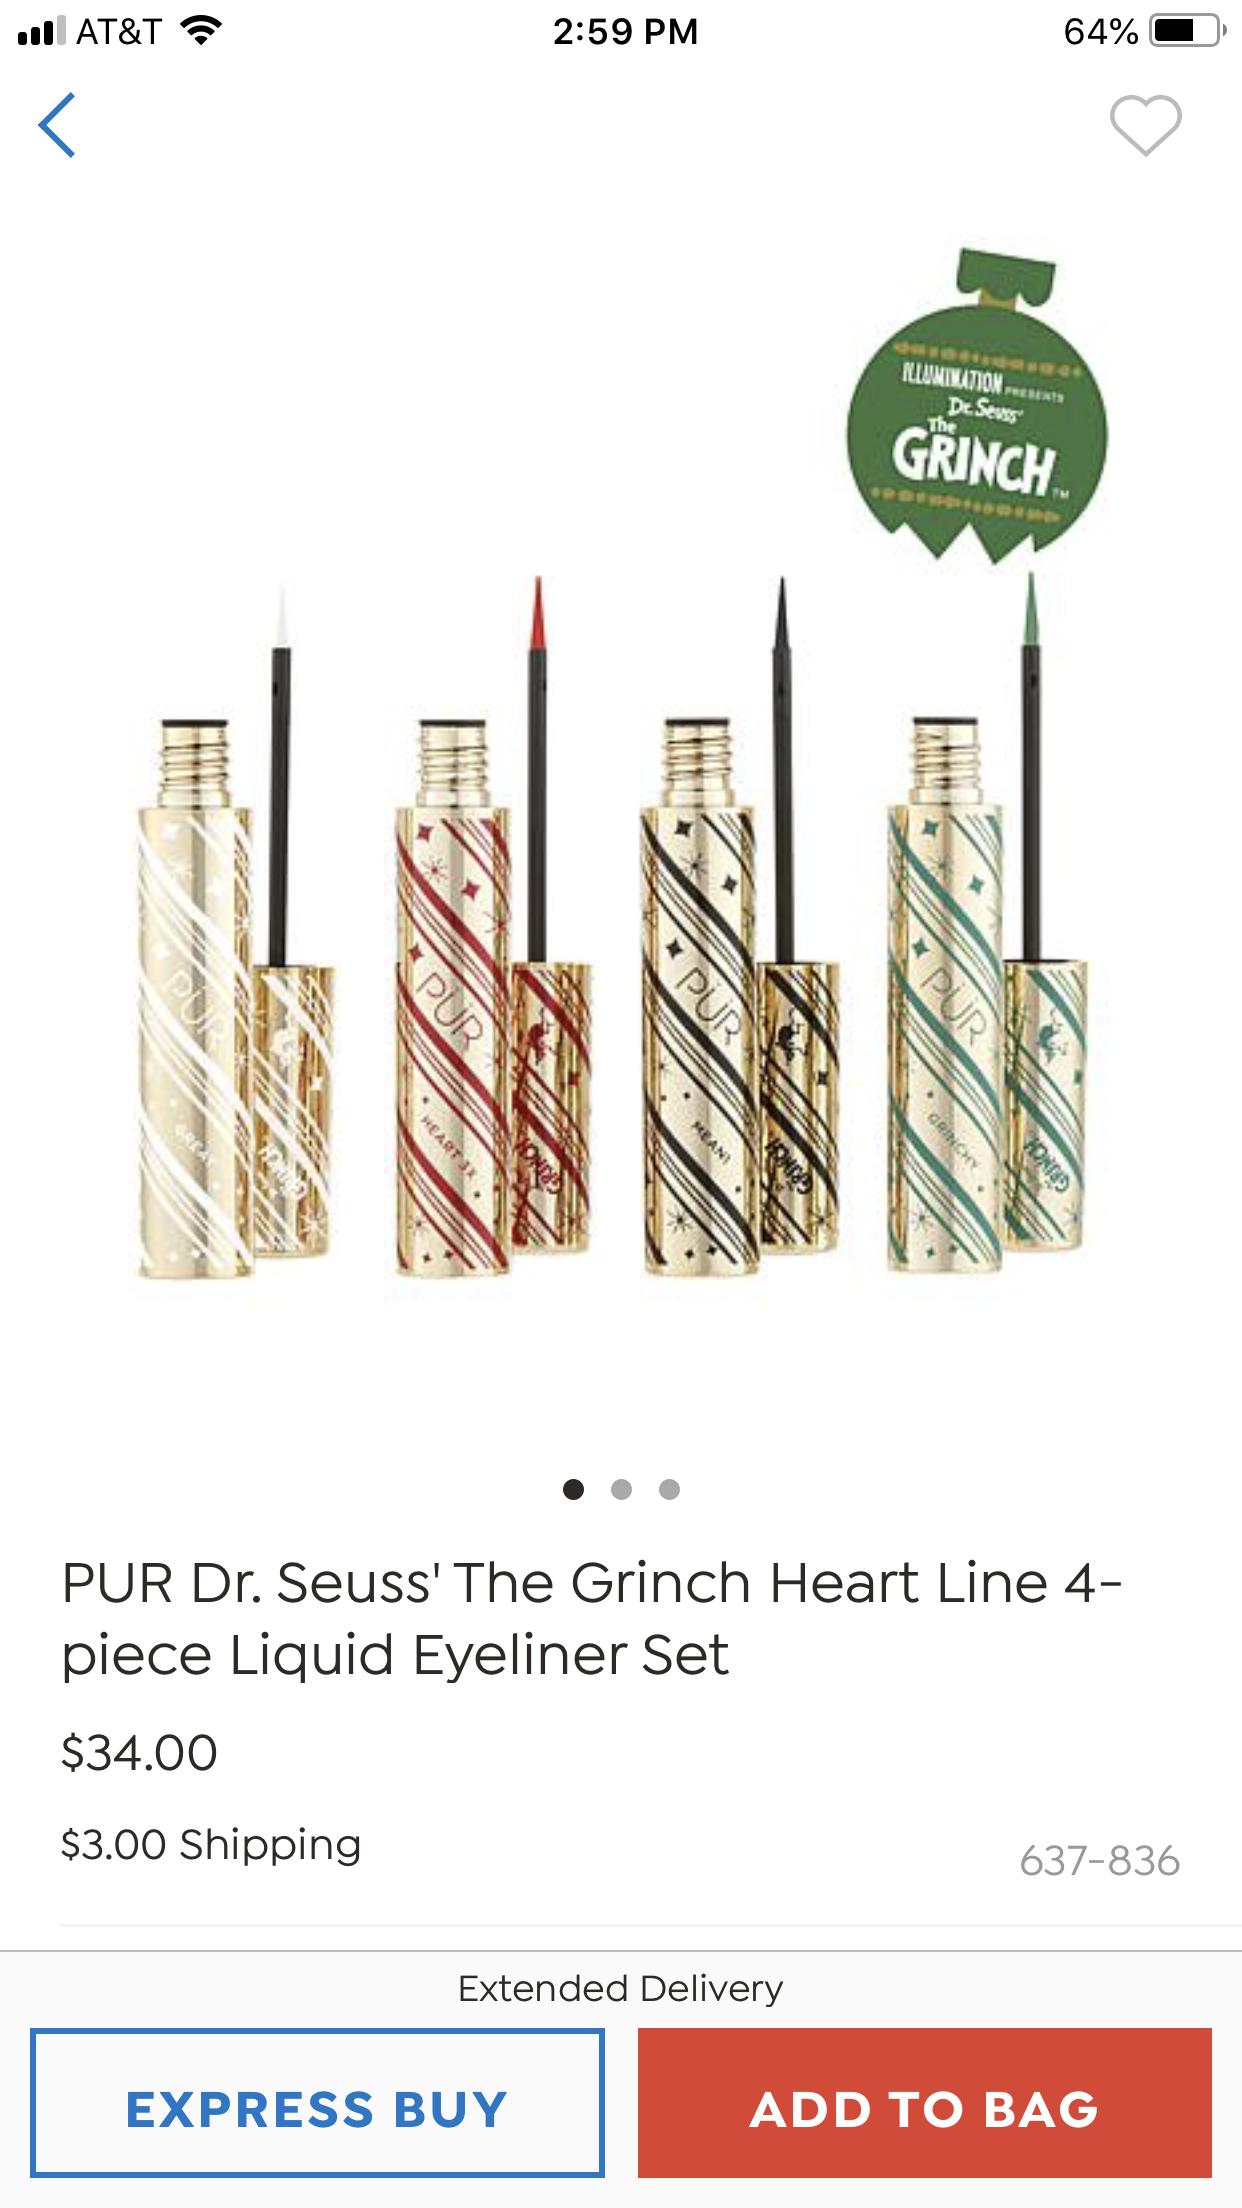 Pin by Lisa Karas on Christmas 2018 Grinch heart, Grinch